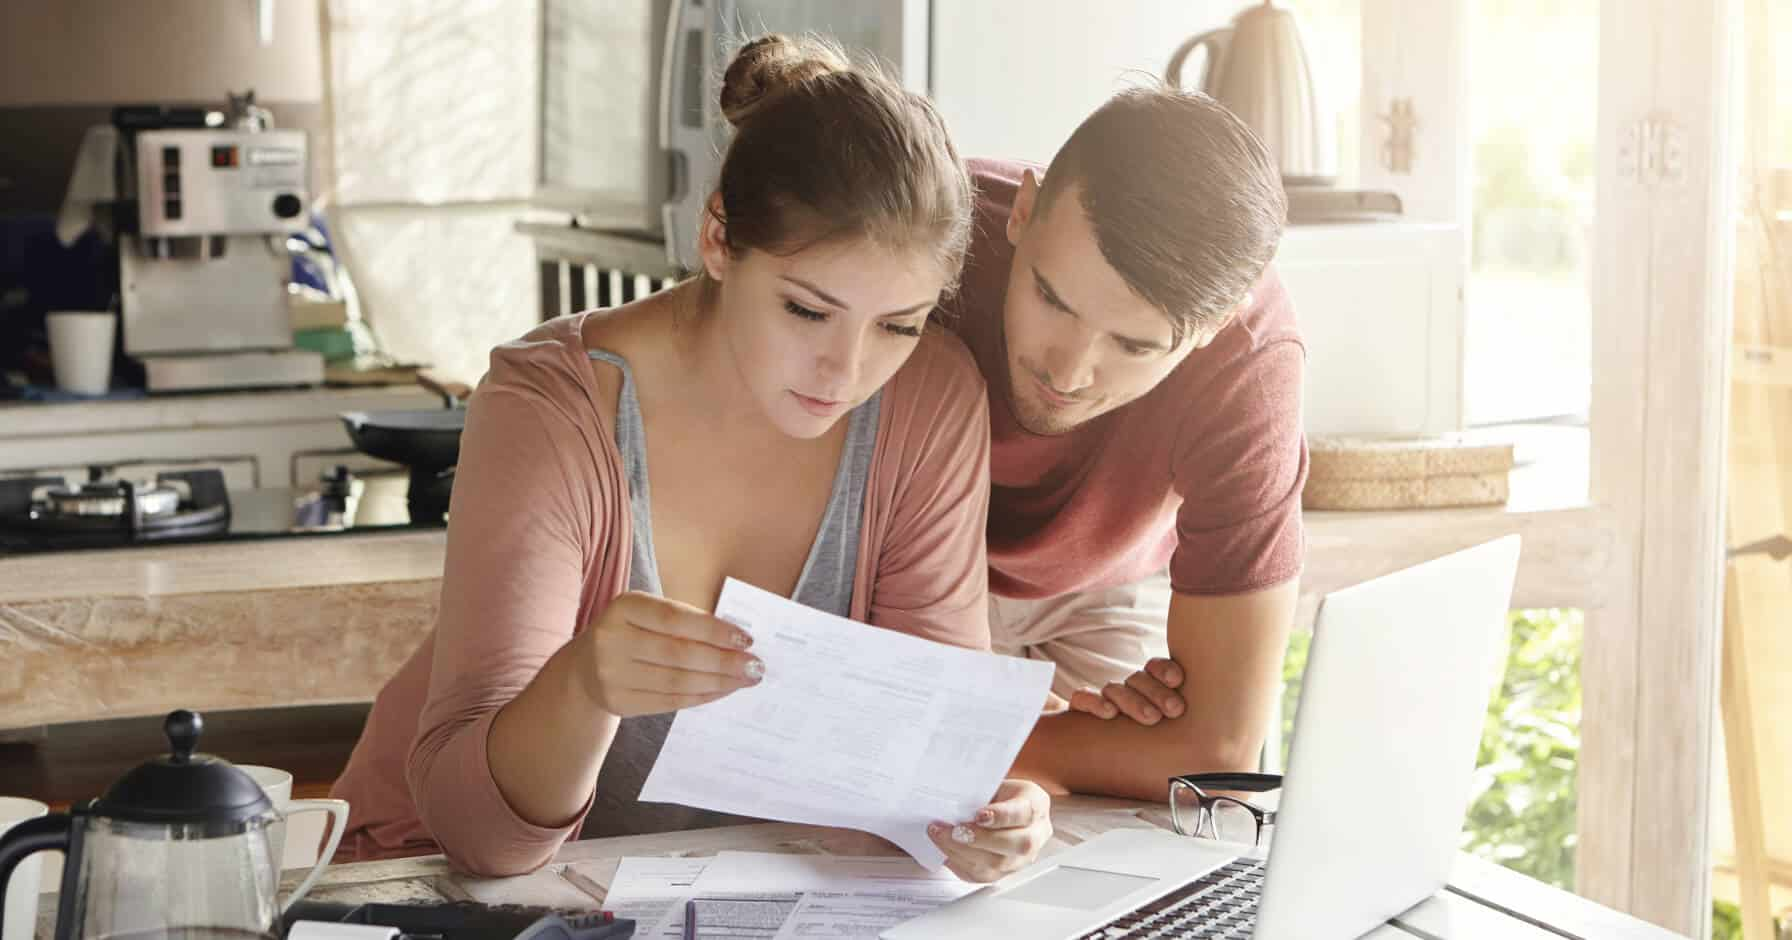 Schenkungssteuer Bei Immobilien I Vermietet De